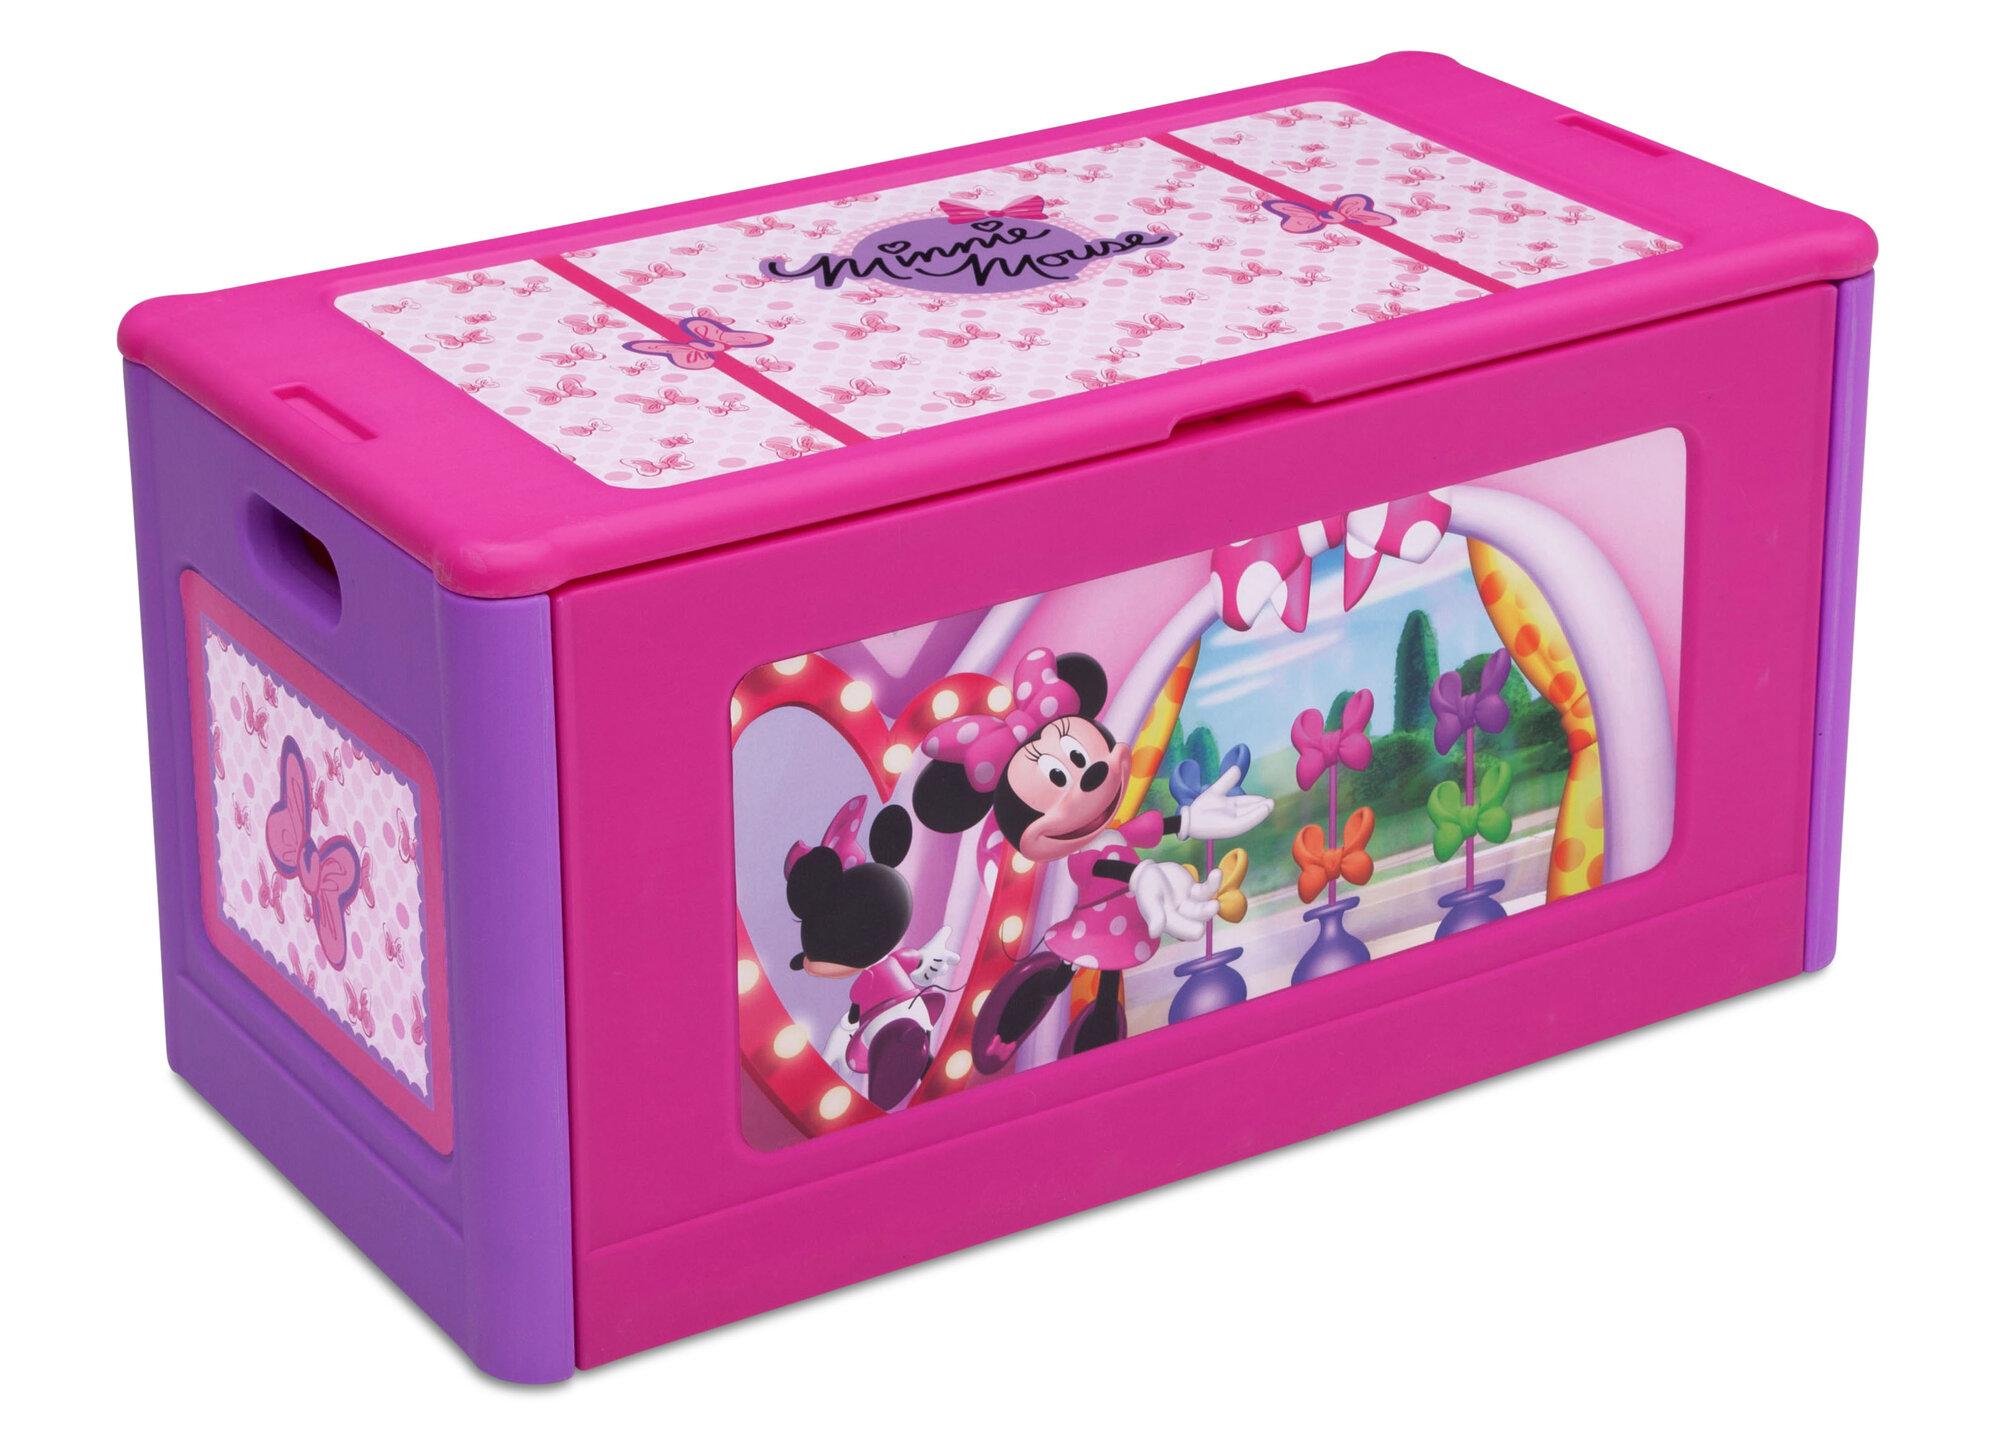 Minnie Mouse Toys : Delta children disney minnie mouse toy box ebay